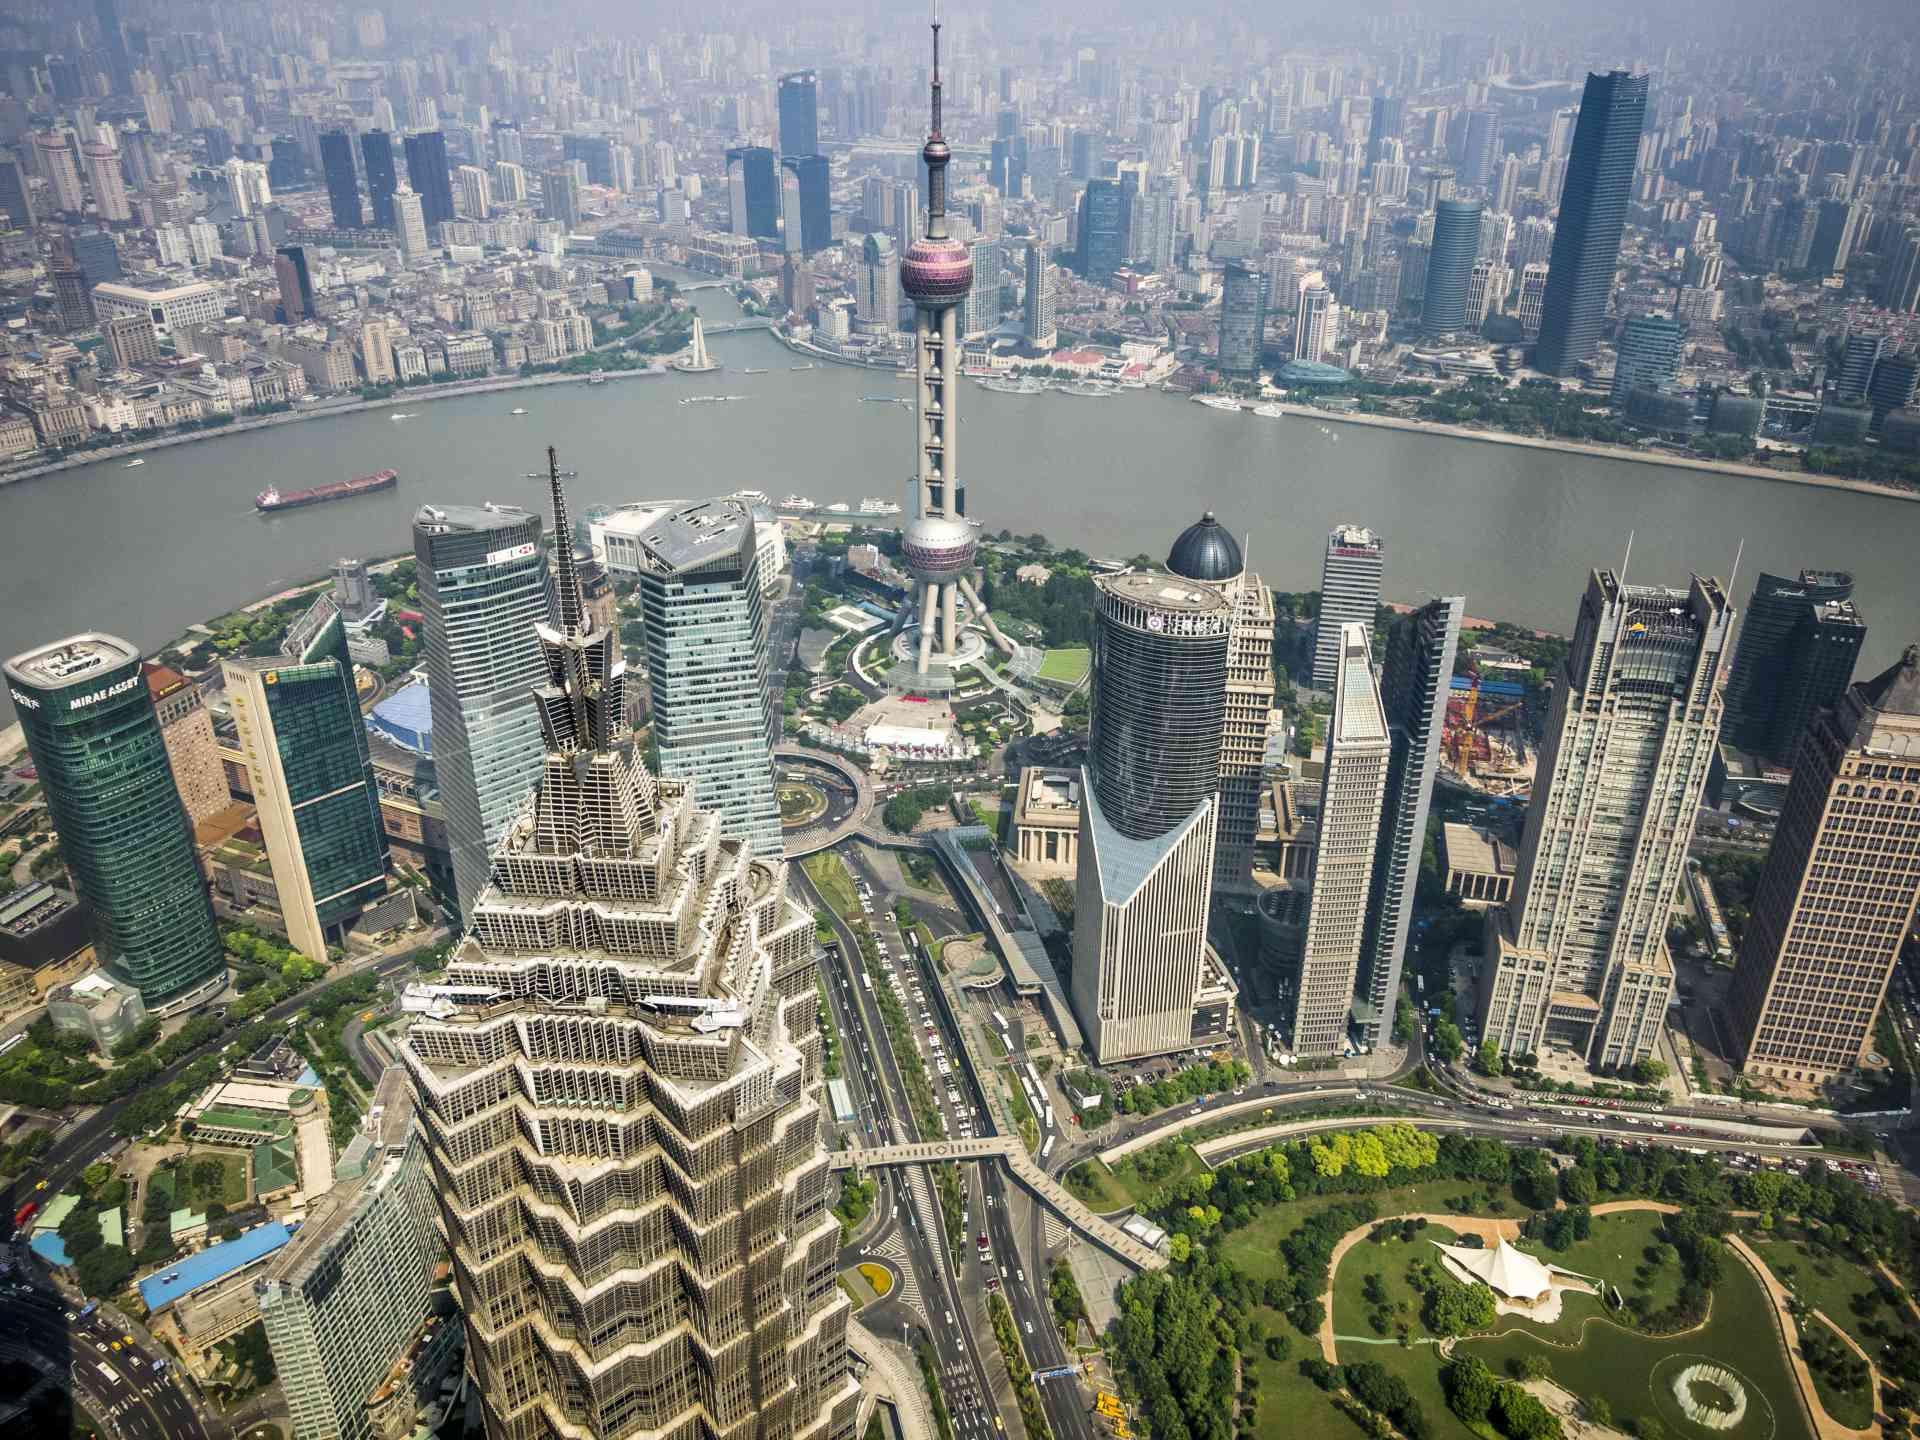 Shanghai skyline, China by David Hein